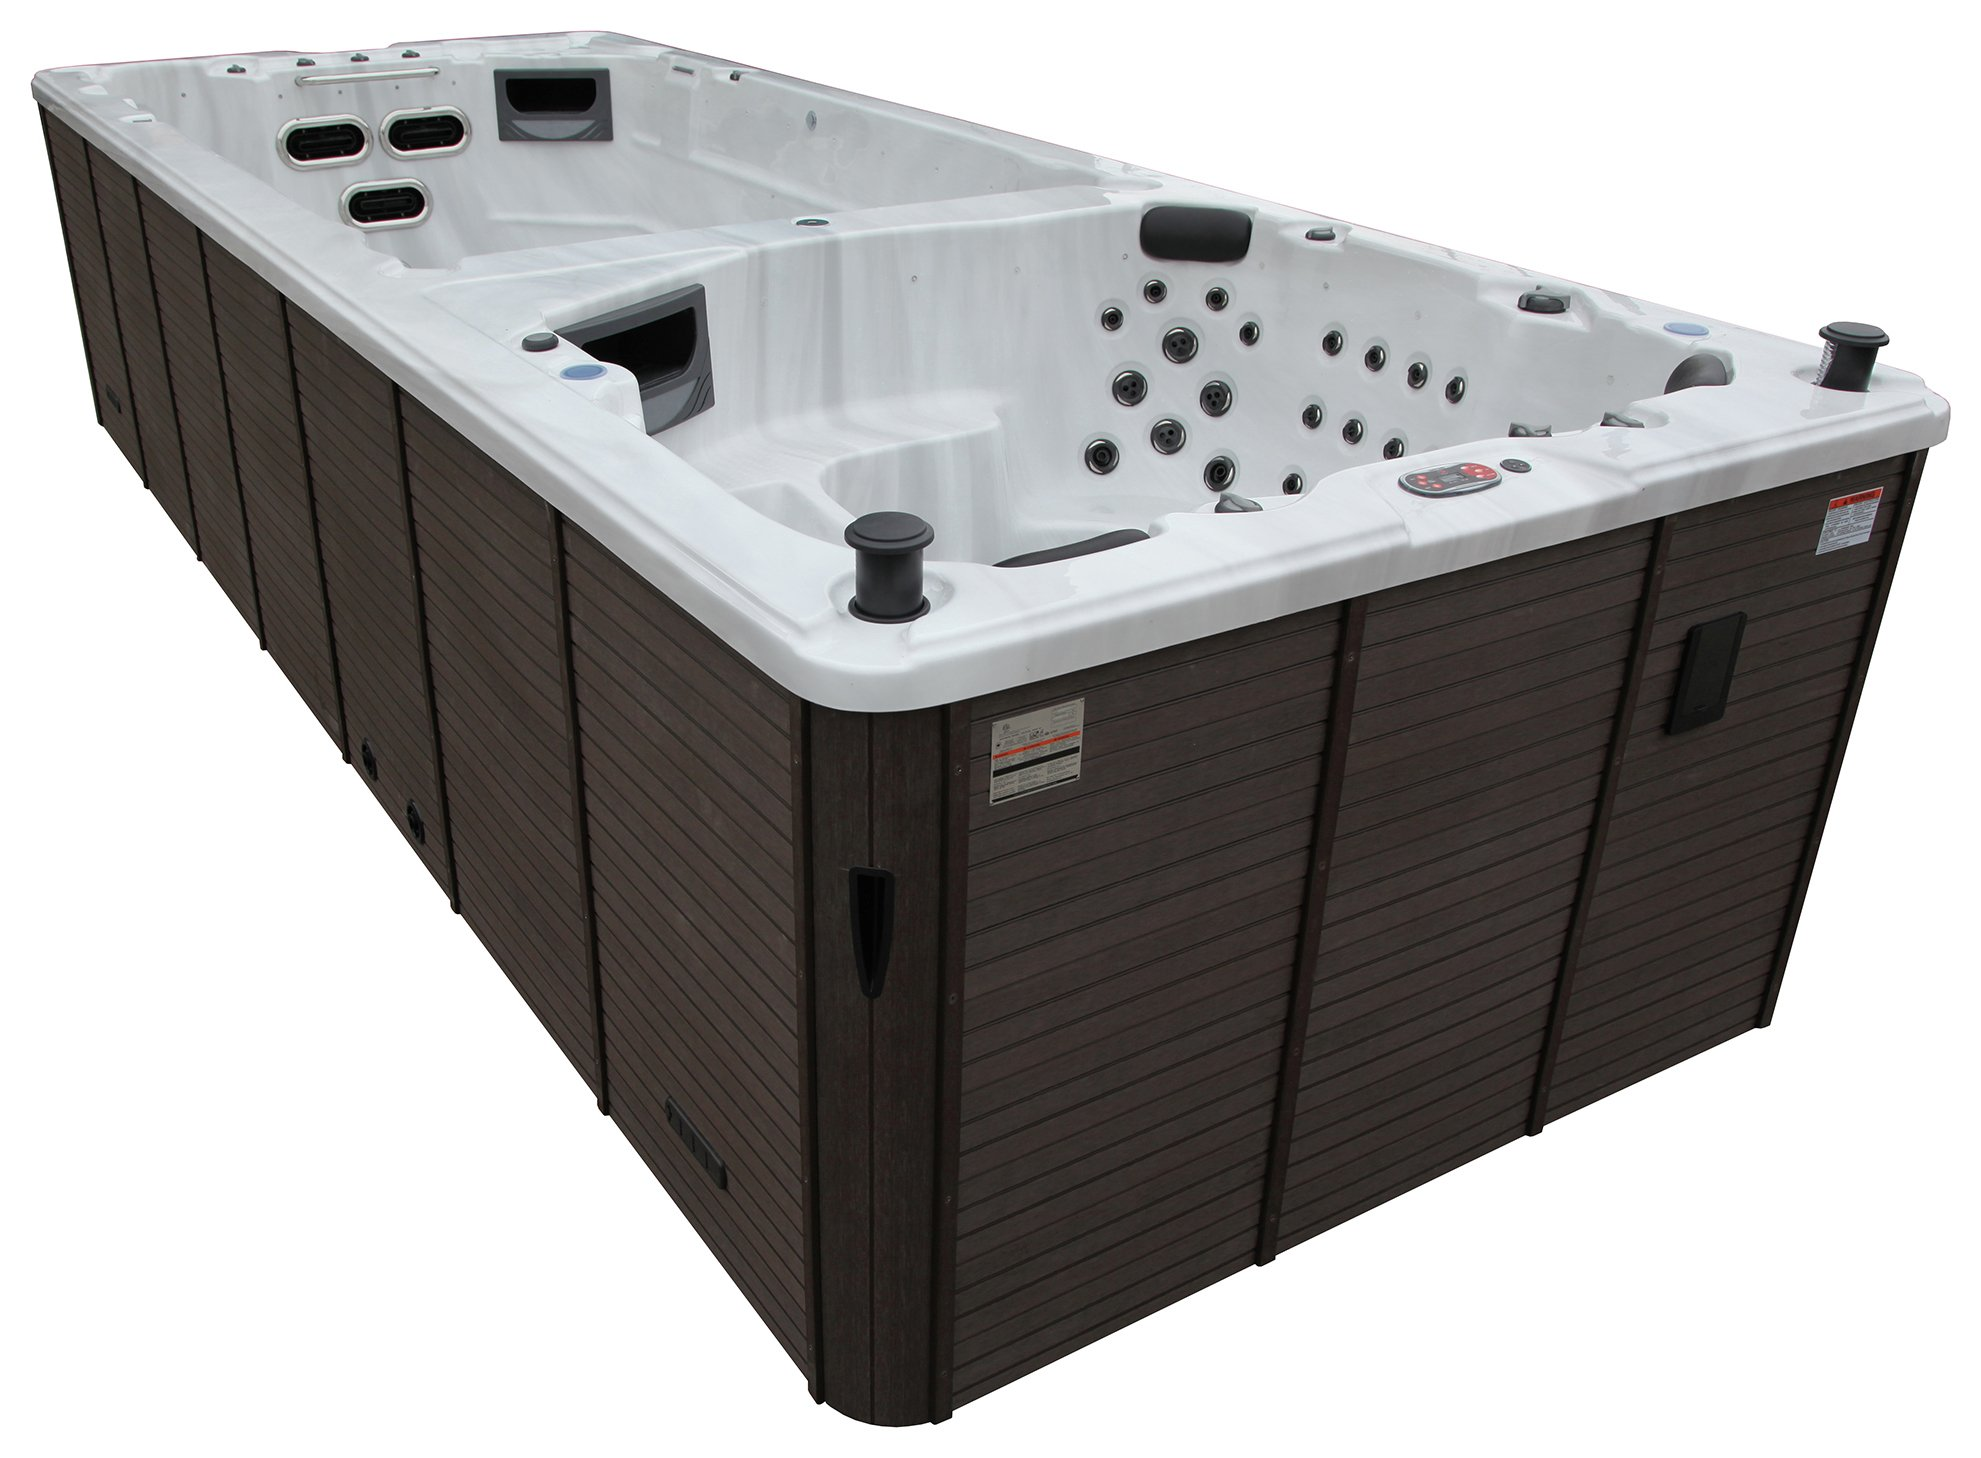 Canadian Spa Company St Lawrence 20ft Swim Hot Tub